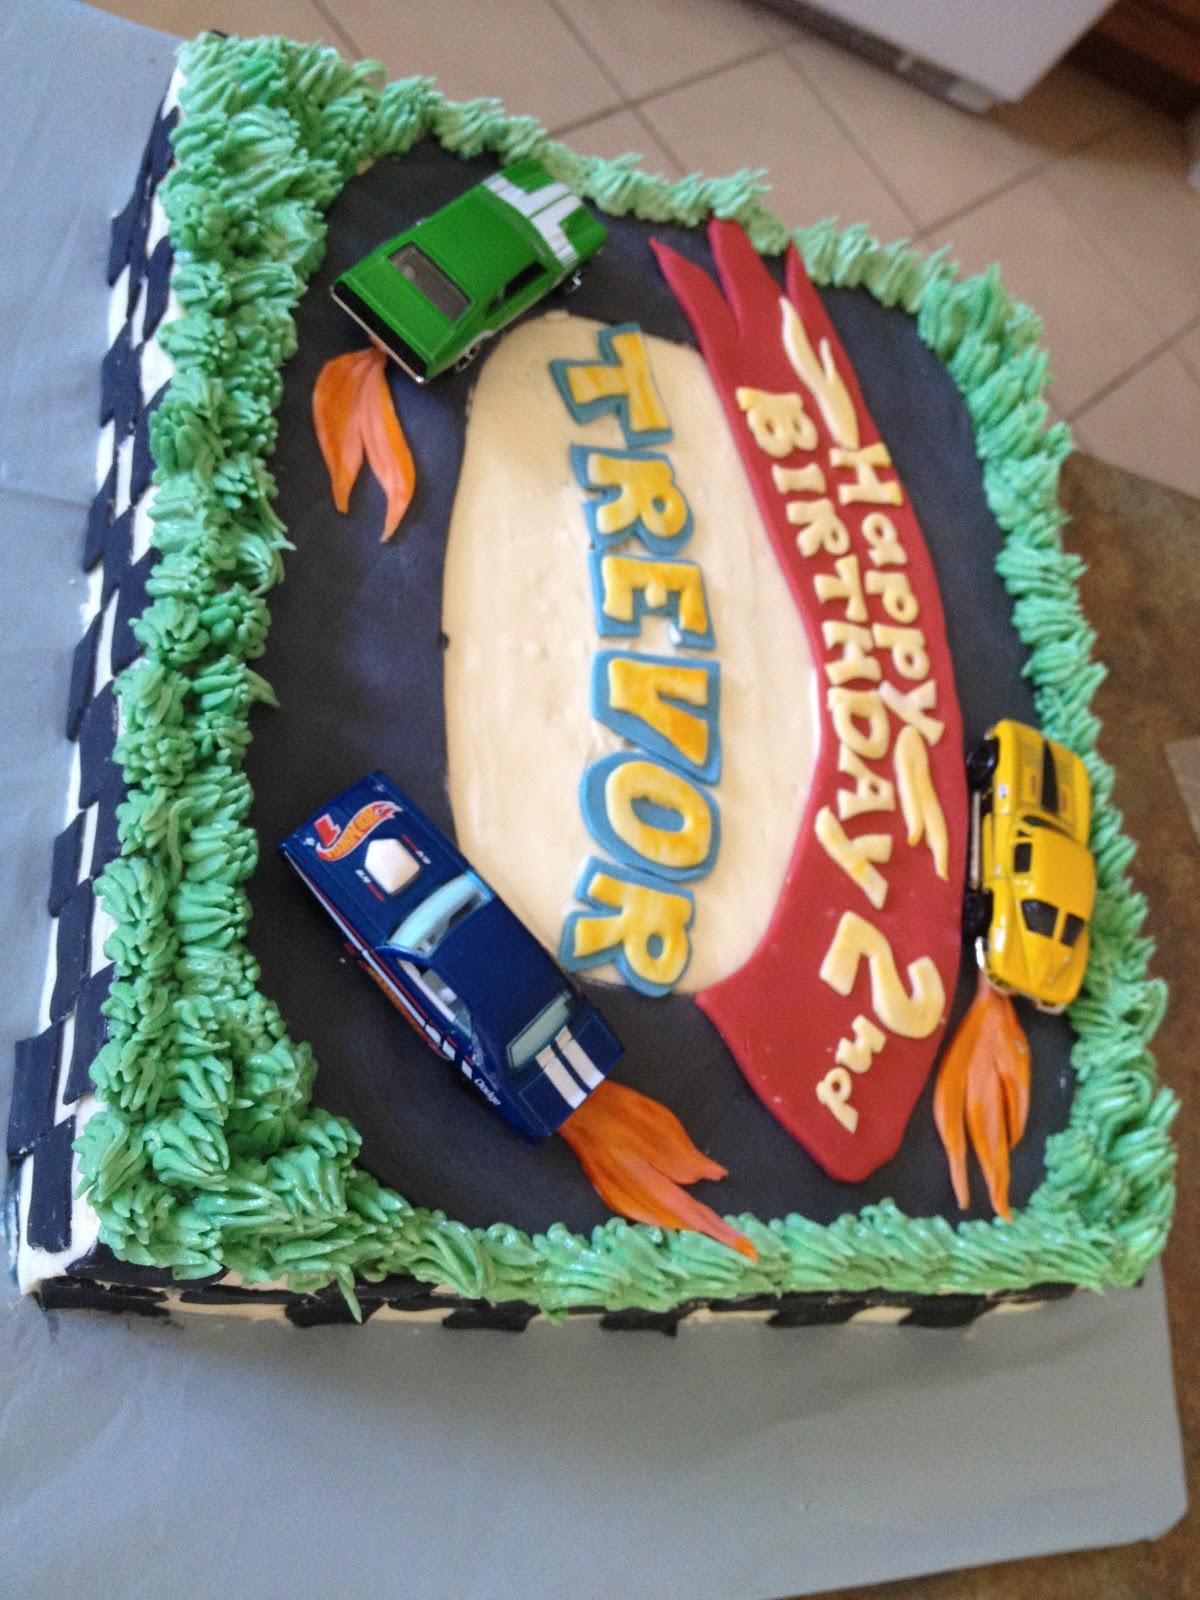 Second Generation Cake Design Hot Wheels Birthday Cake